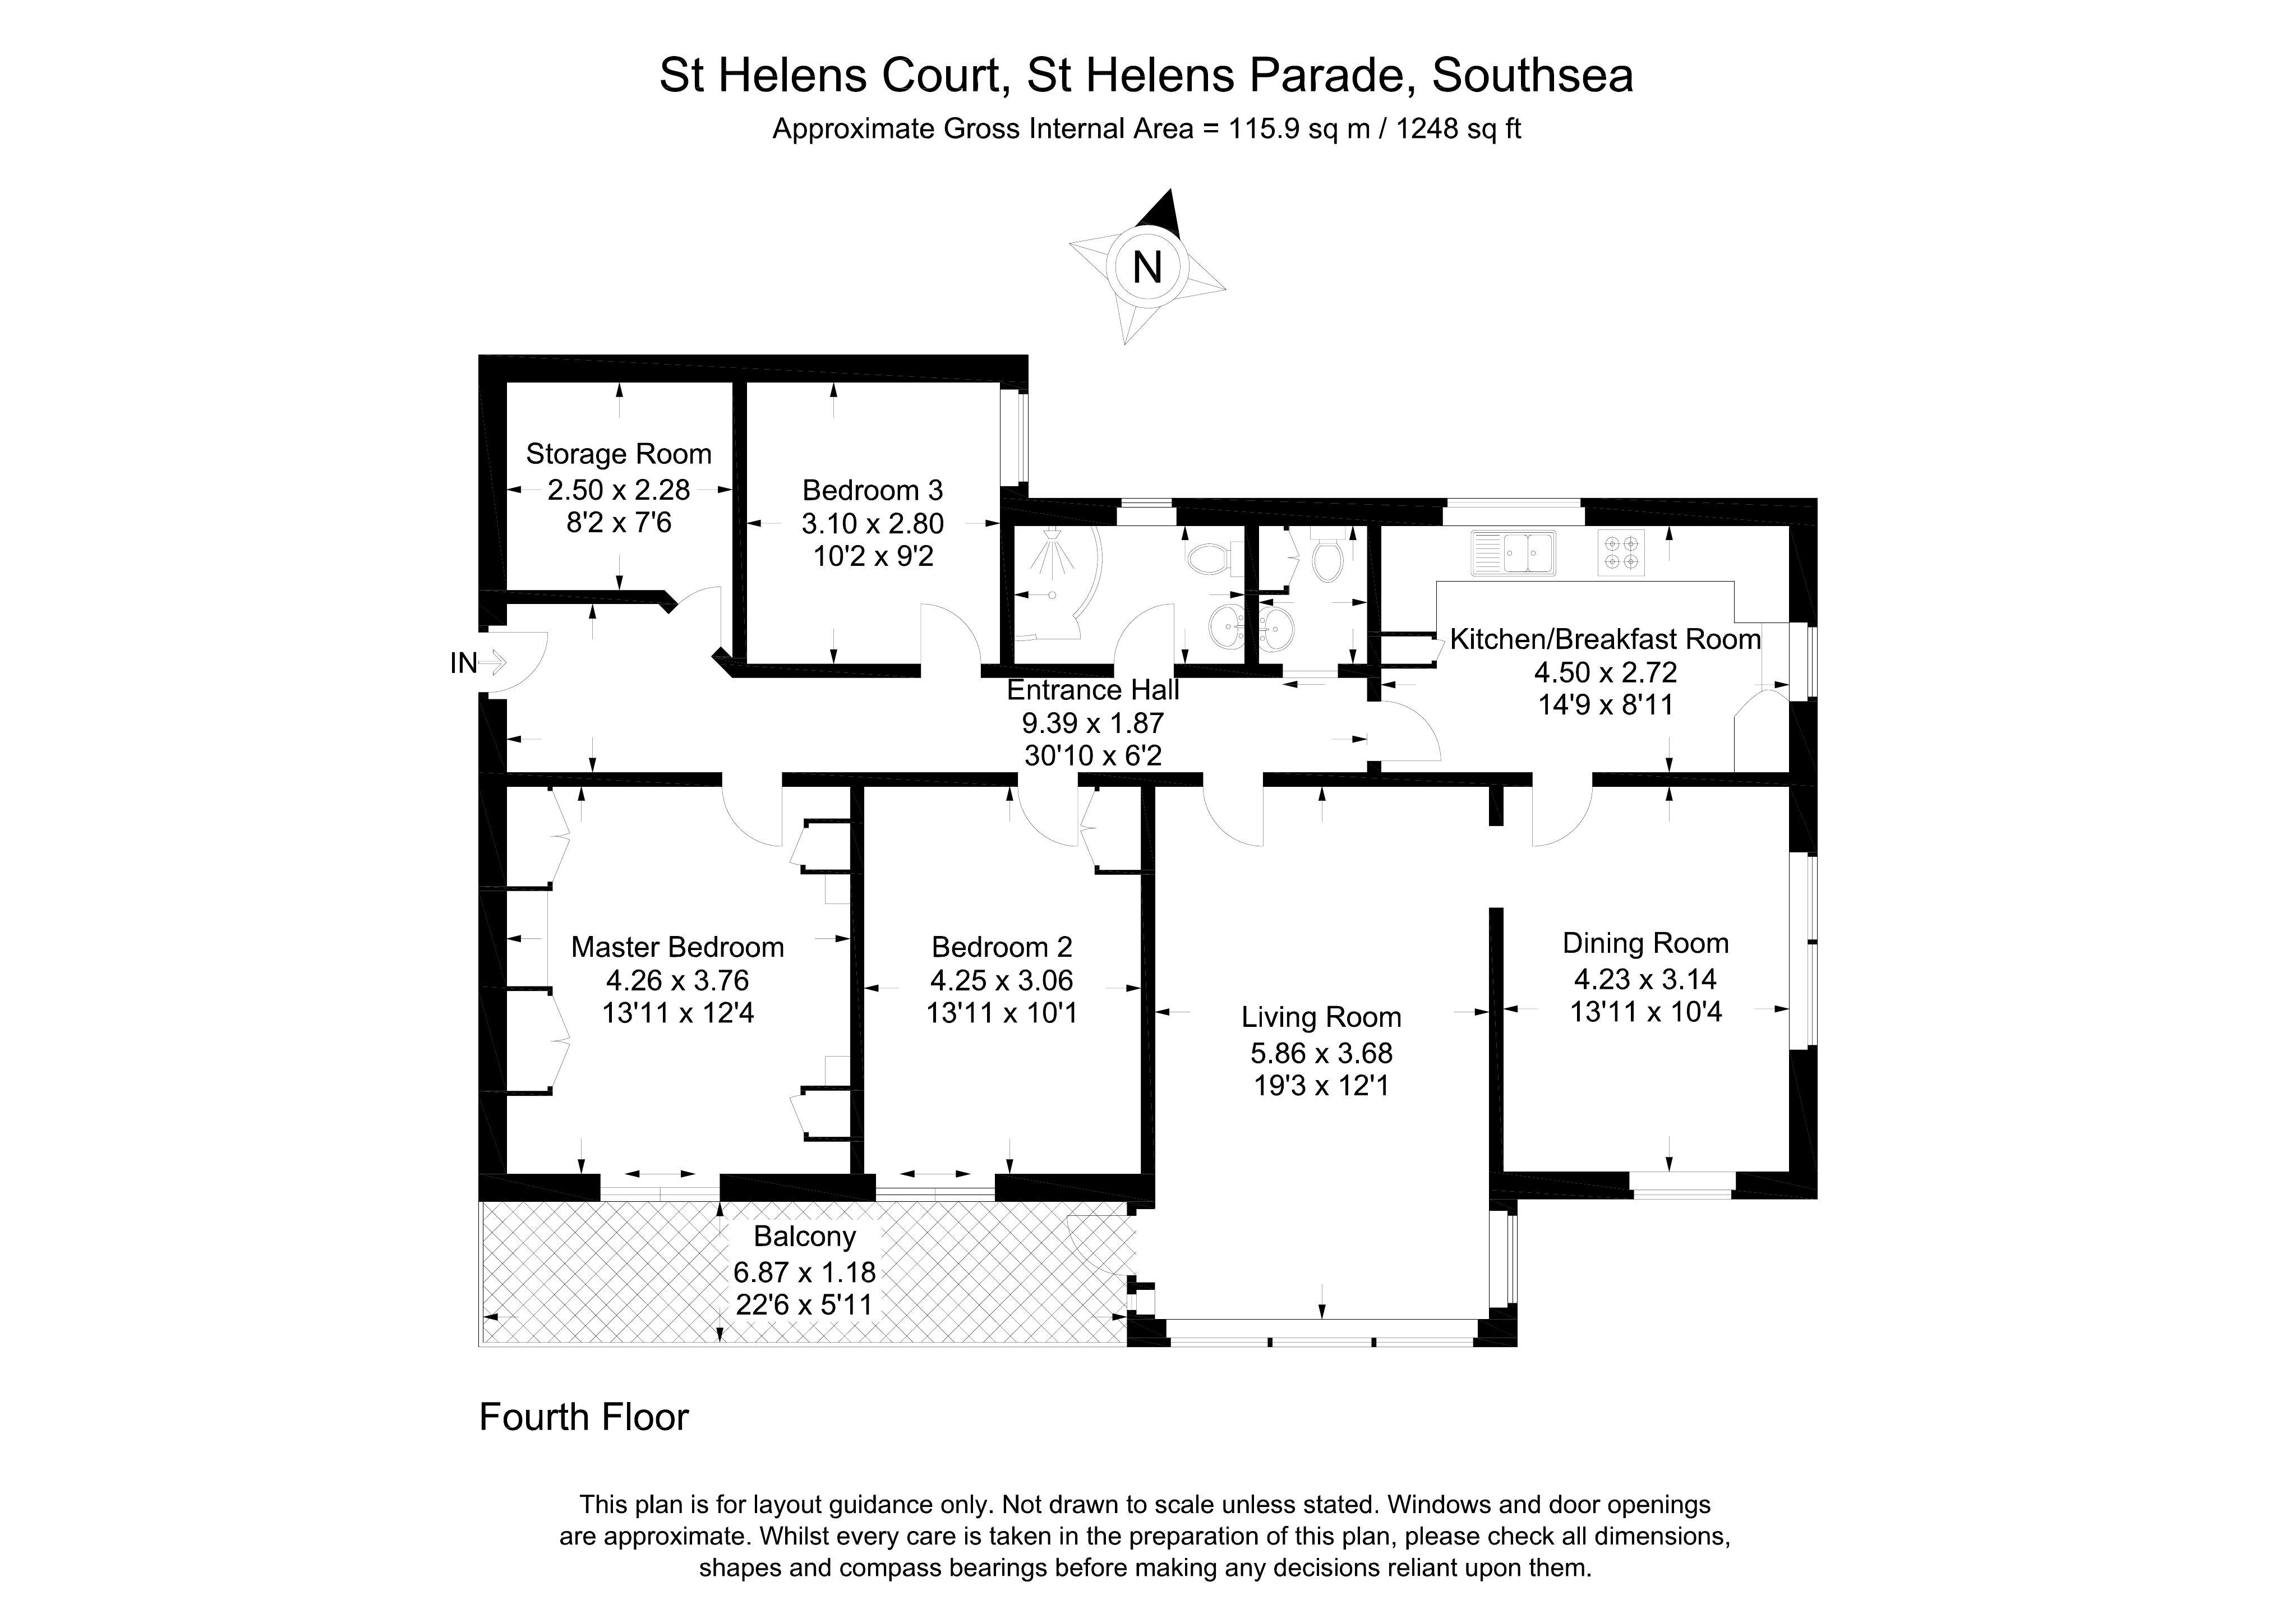 St. Helens Parade